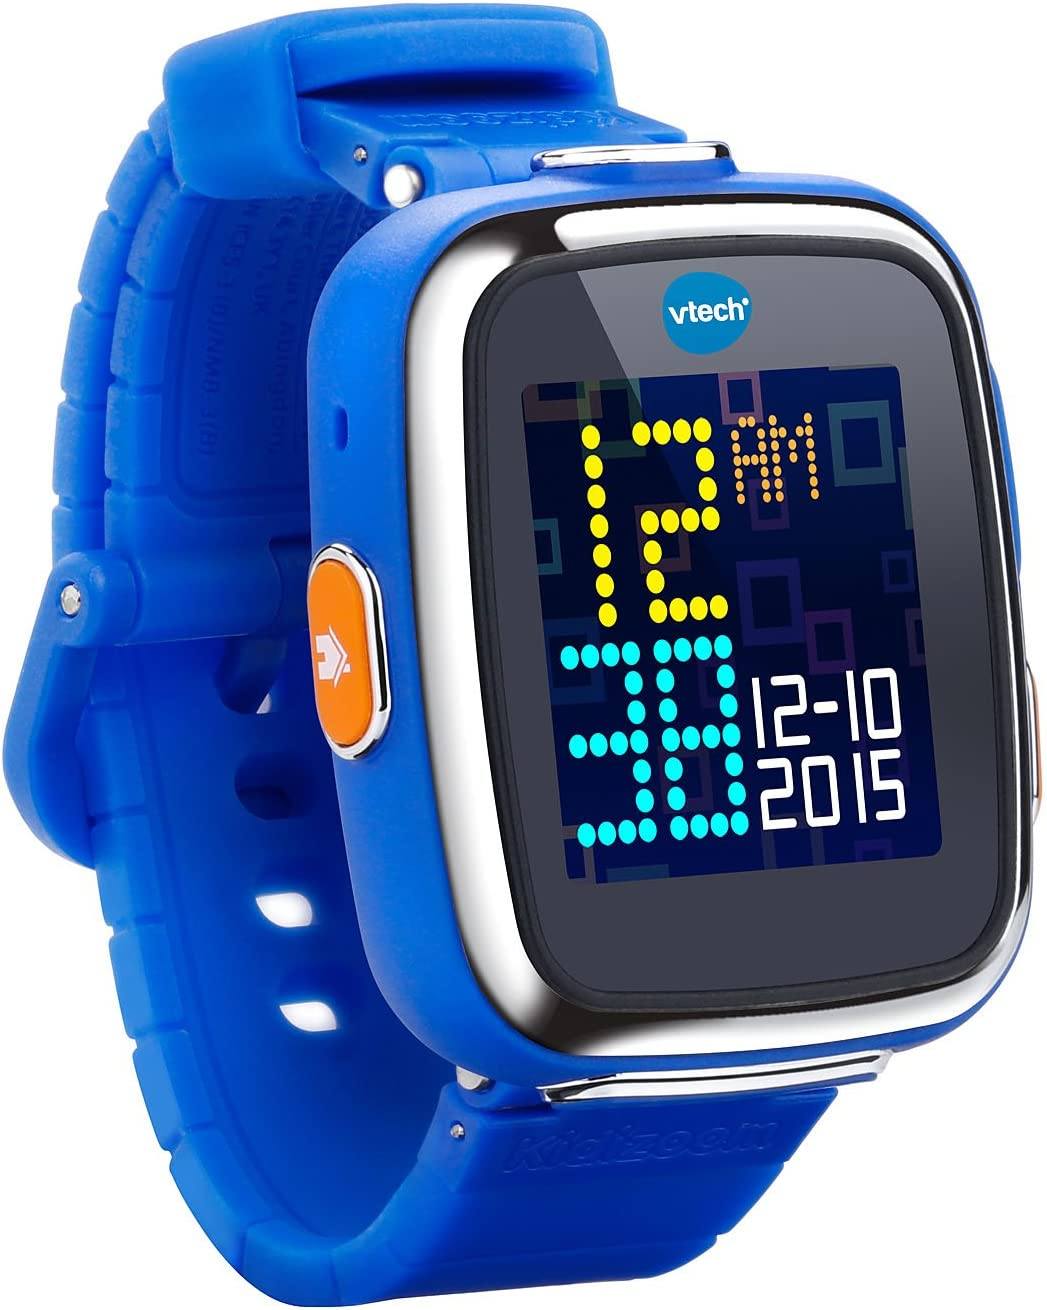 Vtech 80 171604 Kidizoom Smart Watch 2 Blau Spielzeug